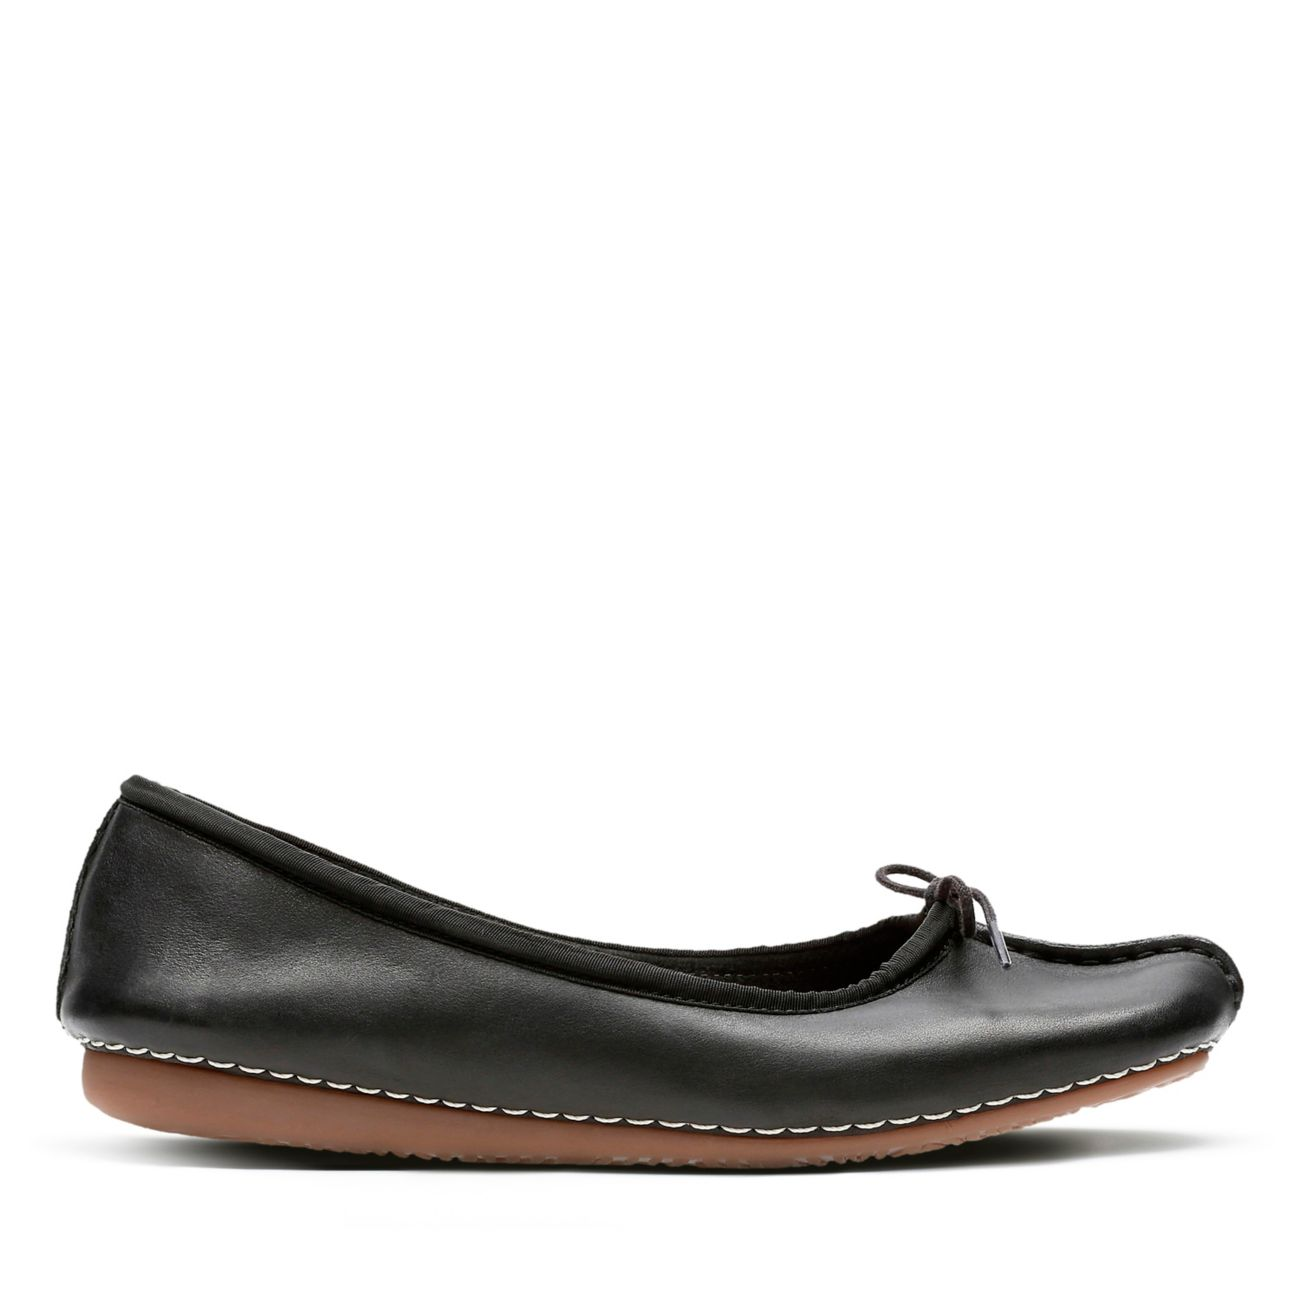 Clarks Freckle Ice 20352929 Damen BALLERINAS schwarz (black Leather) EU 40